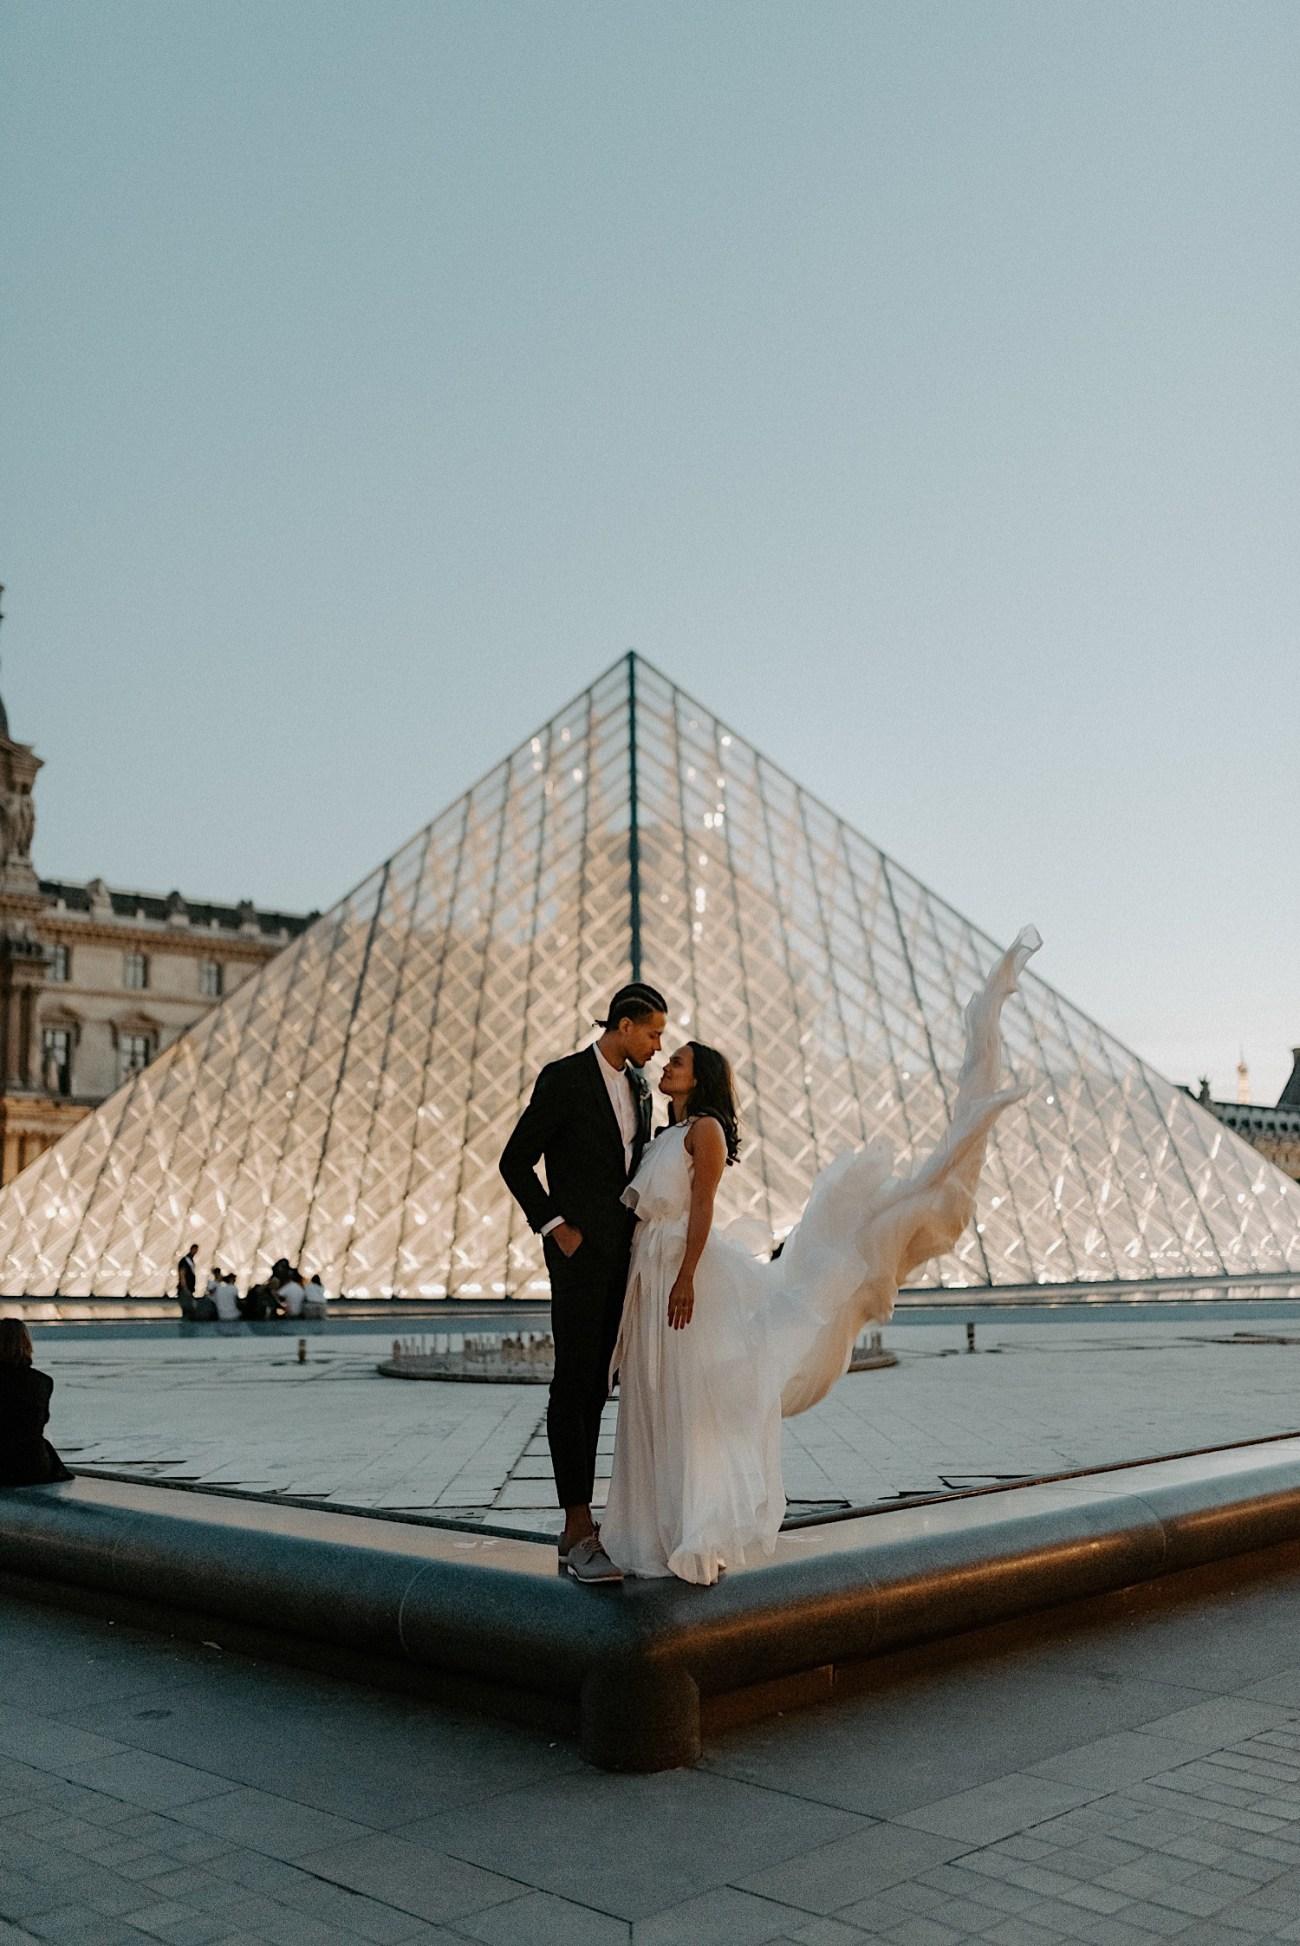 Paris Louvre Wedding Photos Paris Wedding Photographer Destination Wedding France Anais Possamai Photography 27